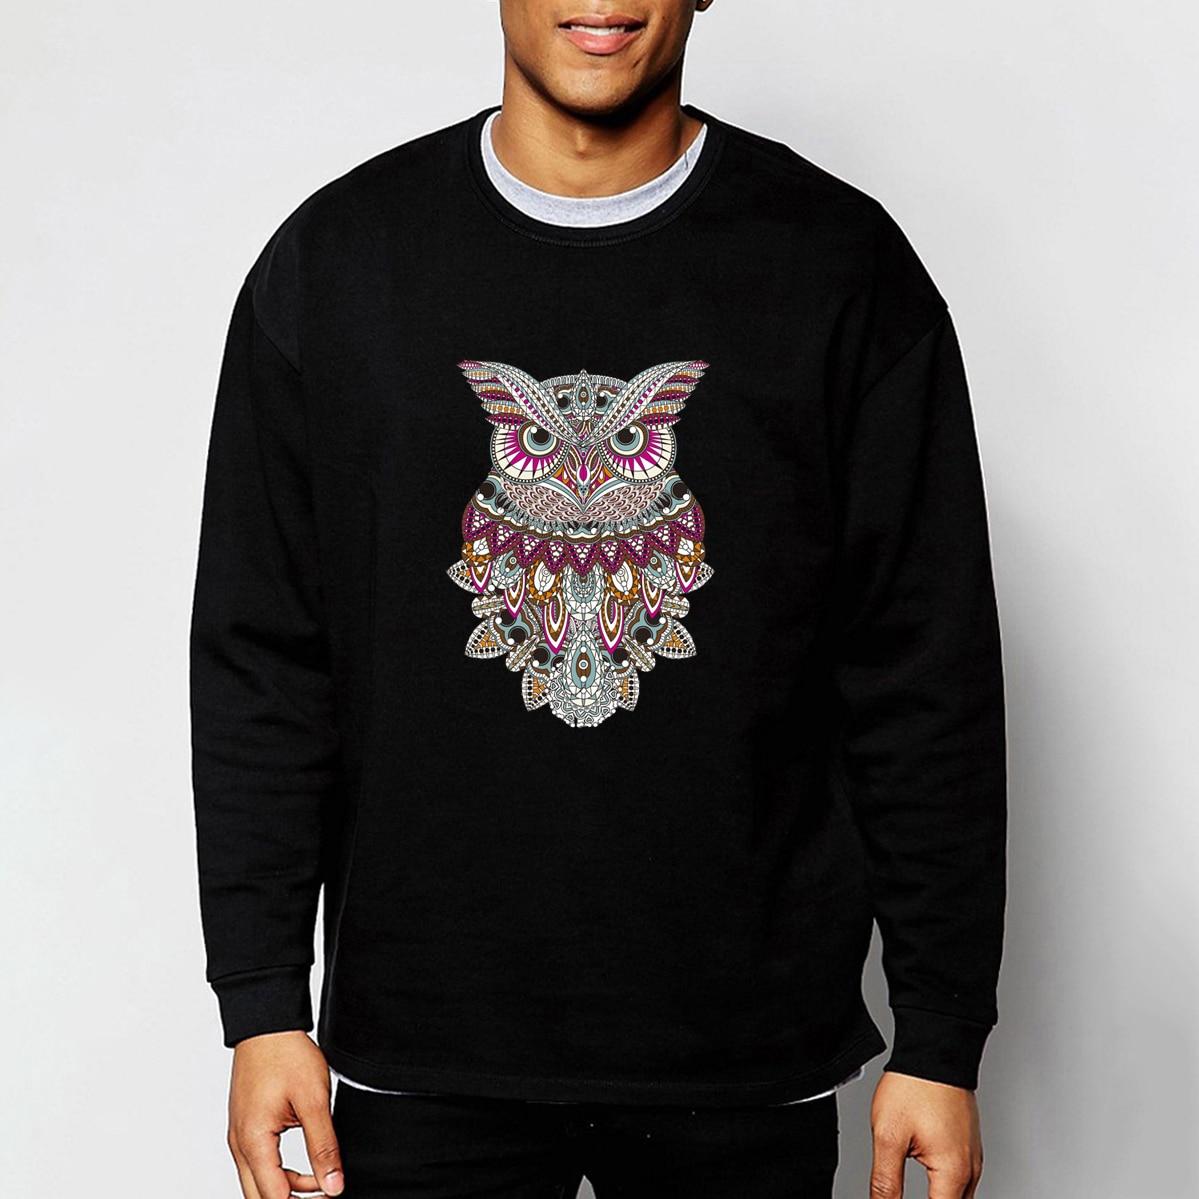 Colorful Animal Owl Sweatshirts Hoodies Men 2019 Spring Cartoon Harajuku Men's Sweatshirt Punk Streetwear Black White Blue CM01